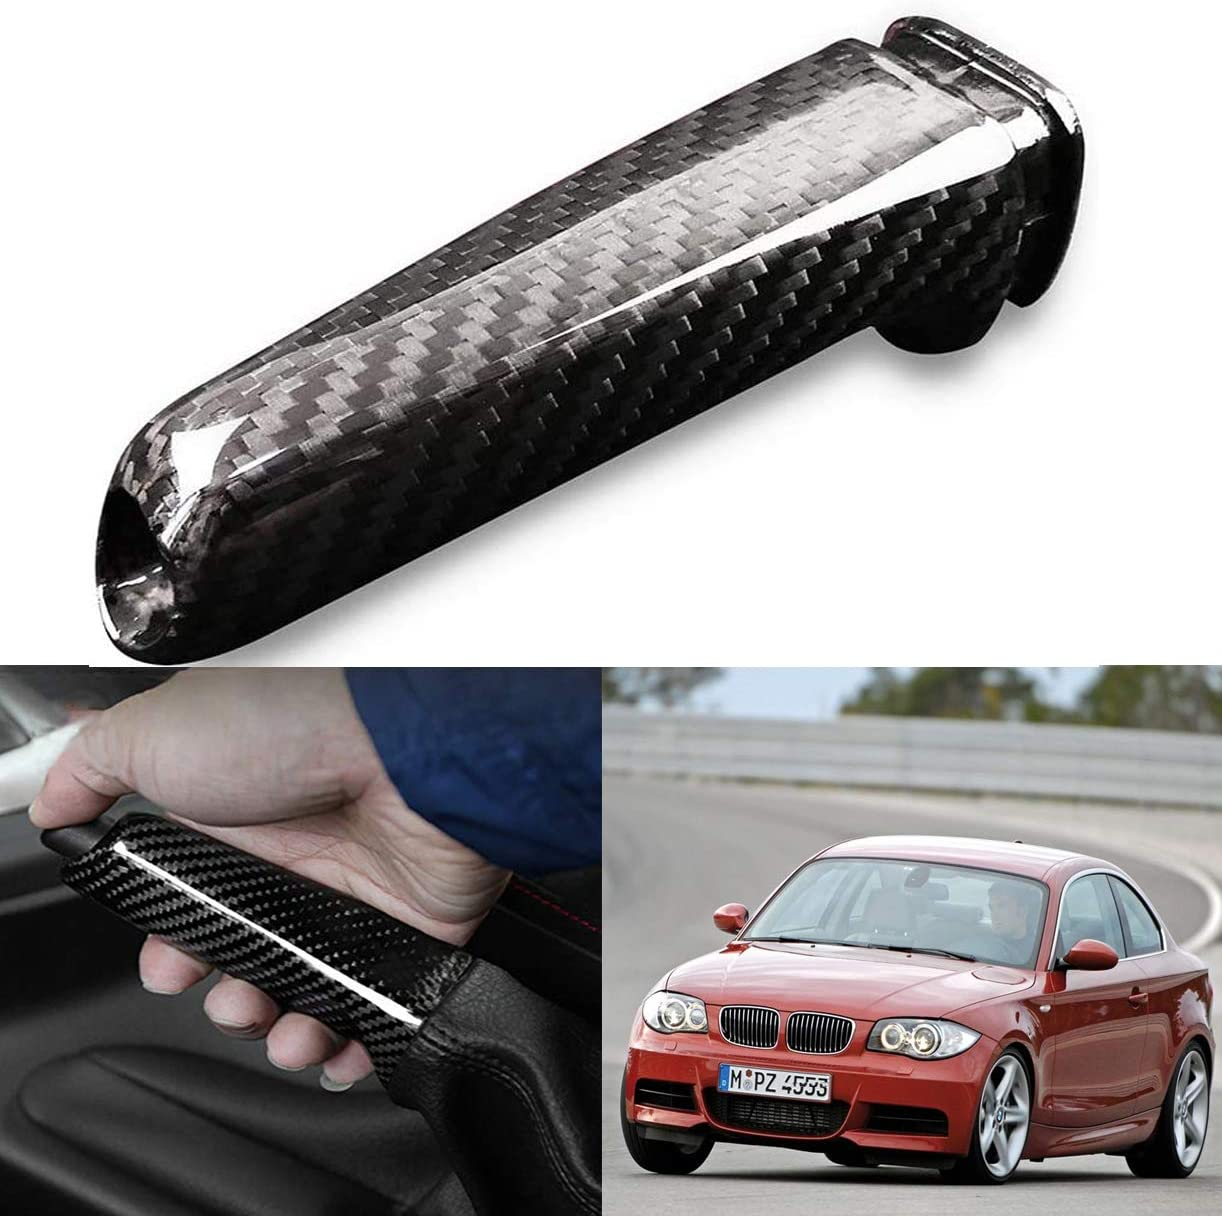 Oritech Car Handbrake Cover Carbon Grip Fiber Brake Choice Max 40% OFF Hand Parking